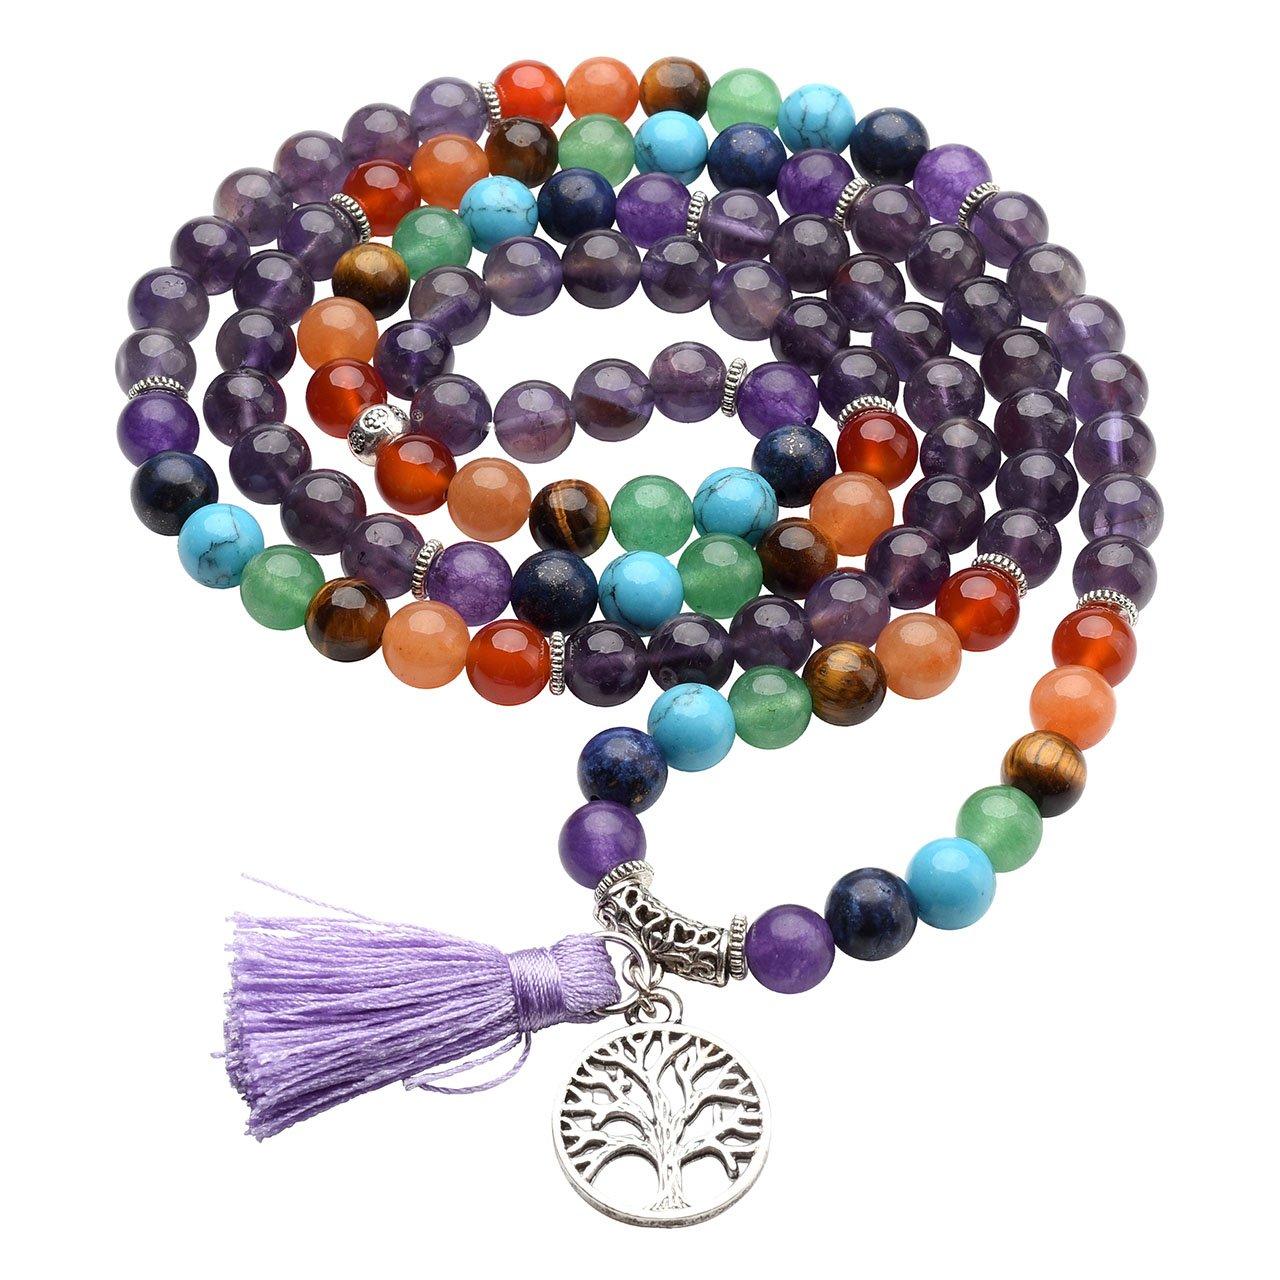 Jovivi 8mm Natural 7 Chakra Healing Crystal Amethyst Crystal Gemstone Buddhist Prayer 108 Beads Tibetan Mala Bracelet Necklace by Jovivi (Image #1)